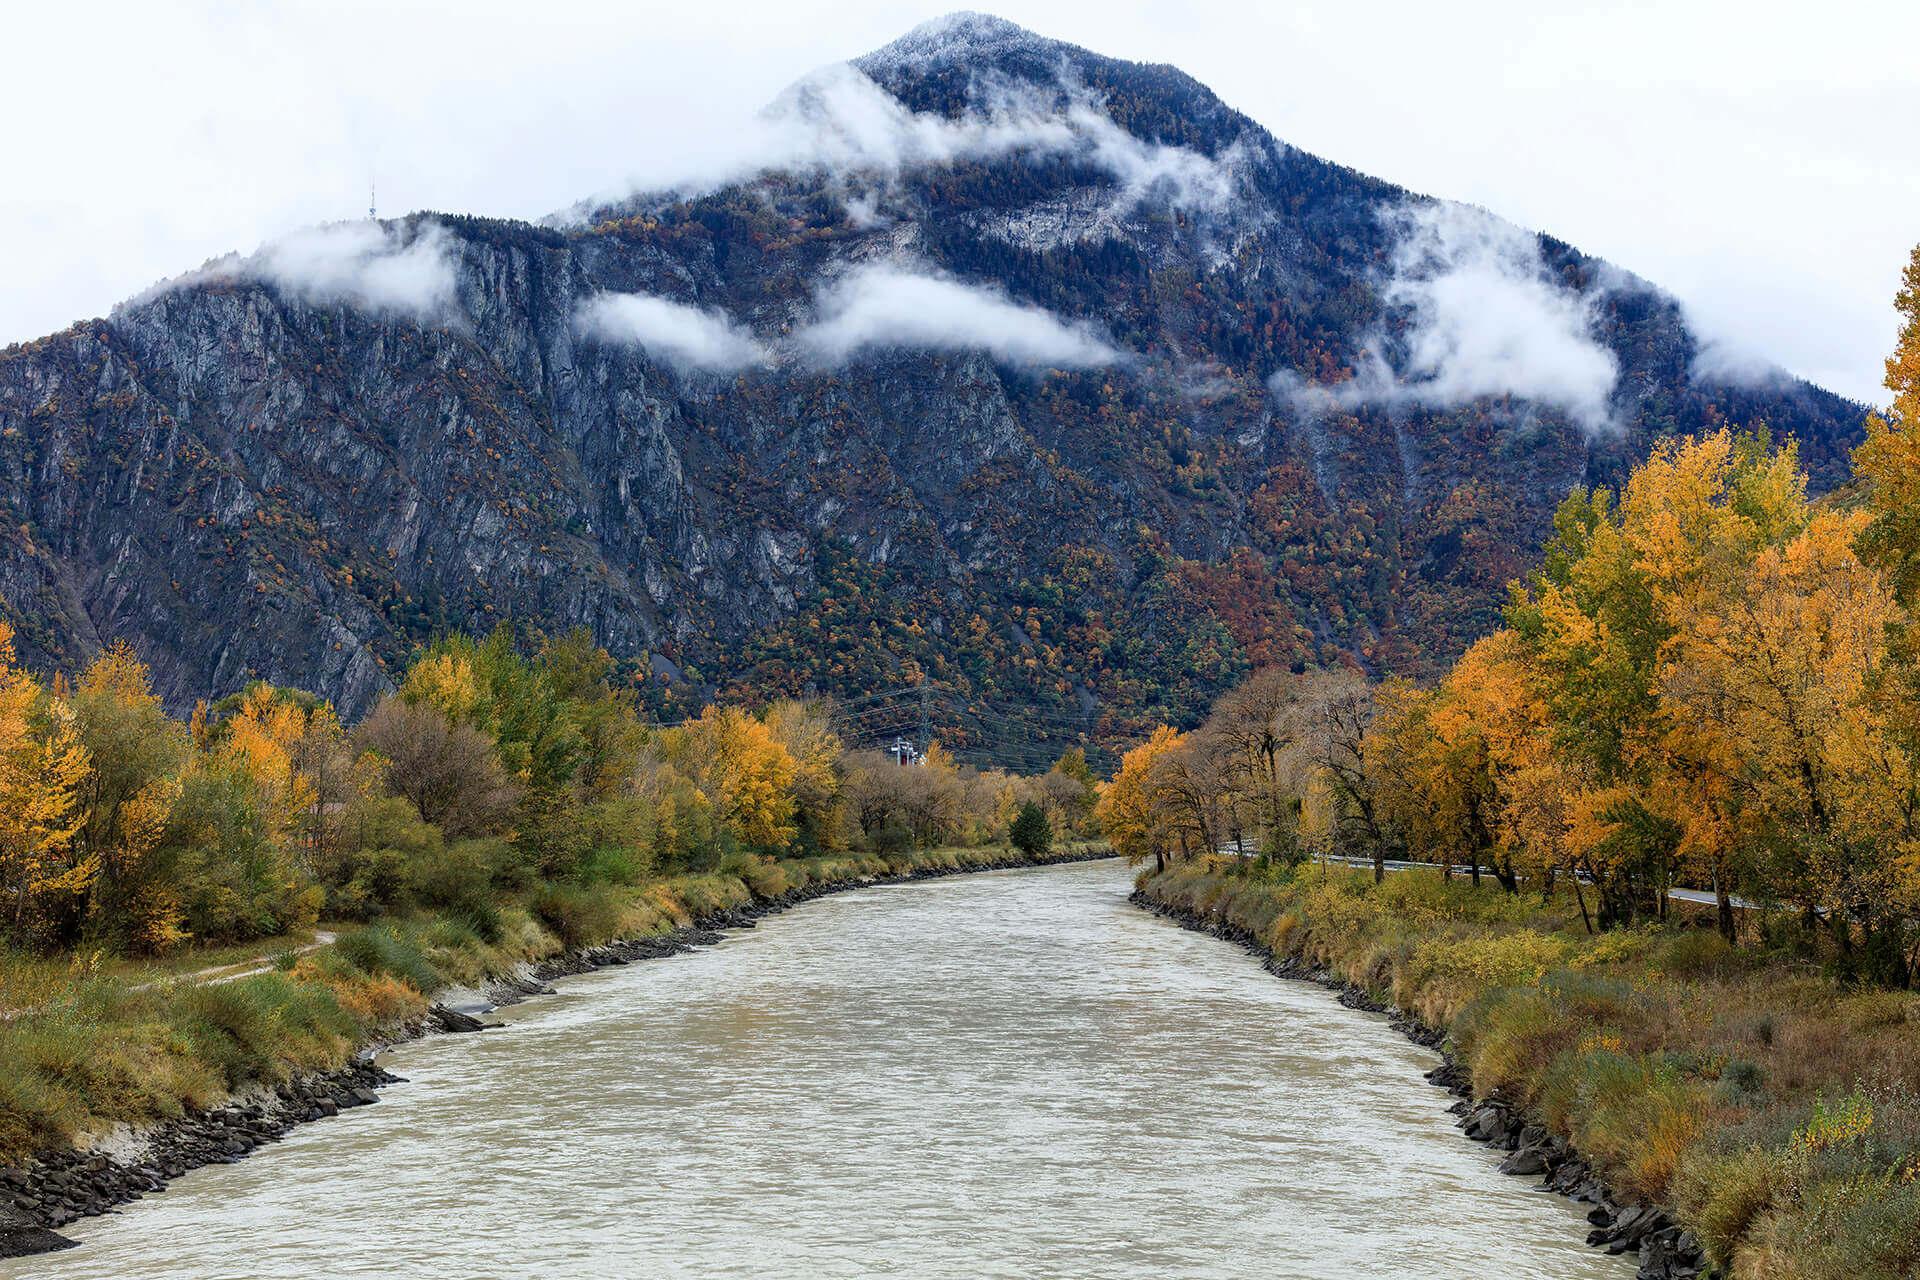 Le fleuve Rhône, Km 127 Canton du Valais, Coude de Martigny